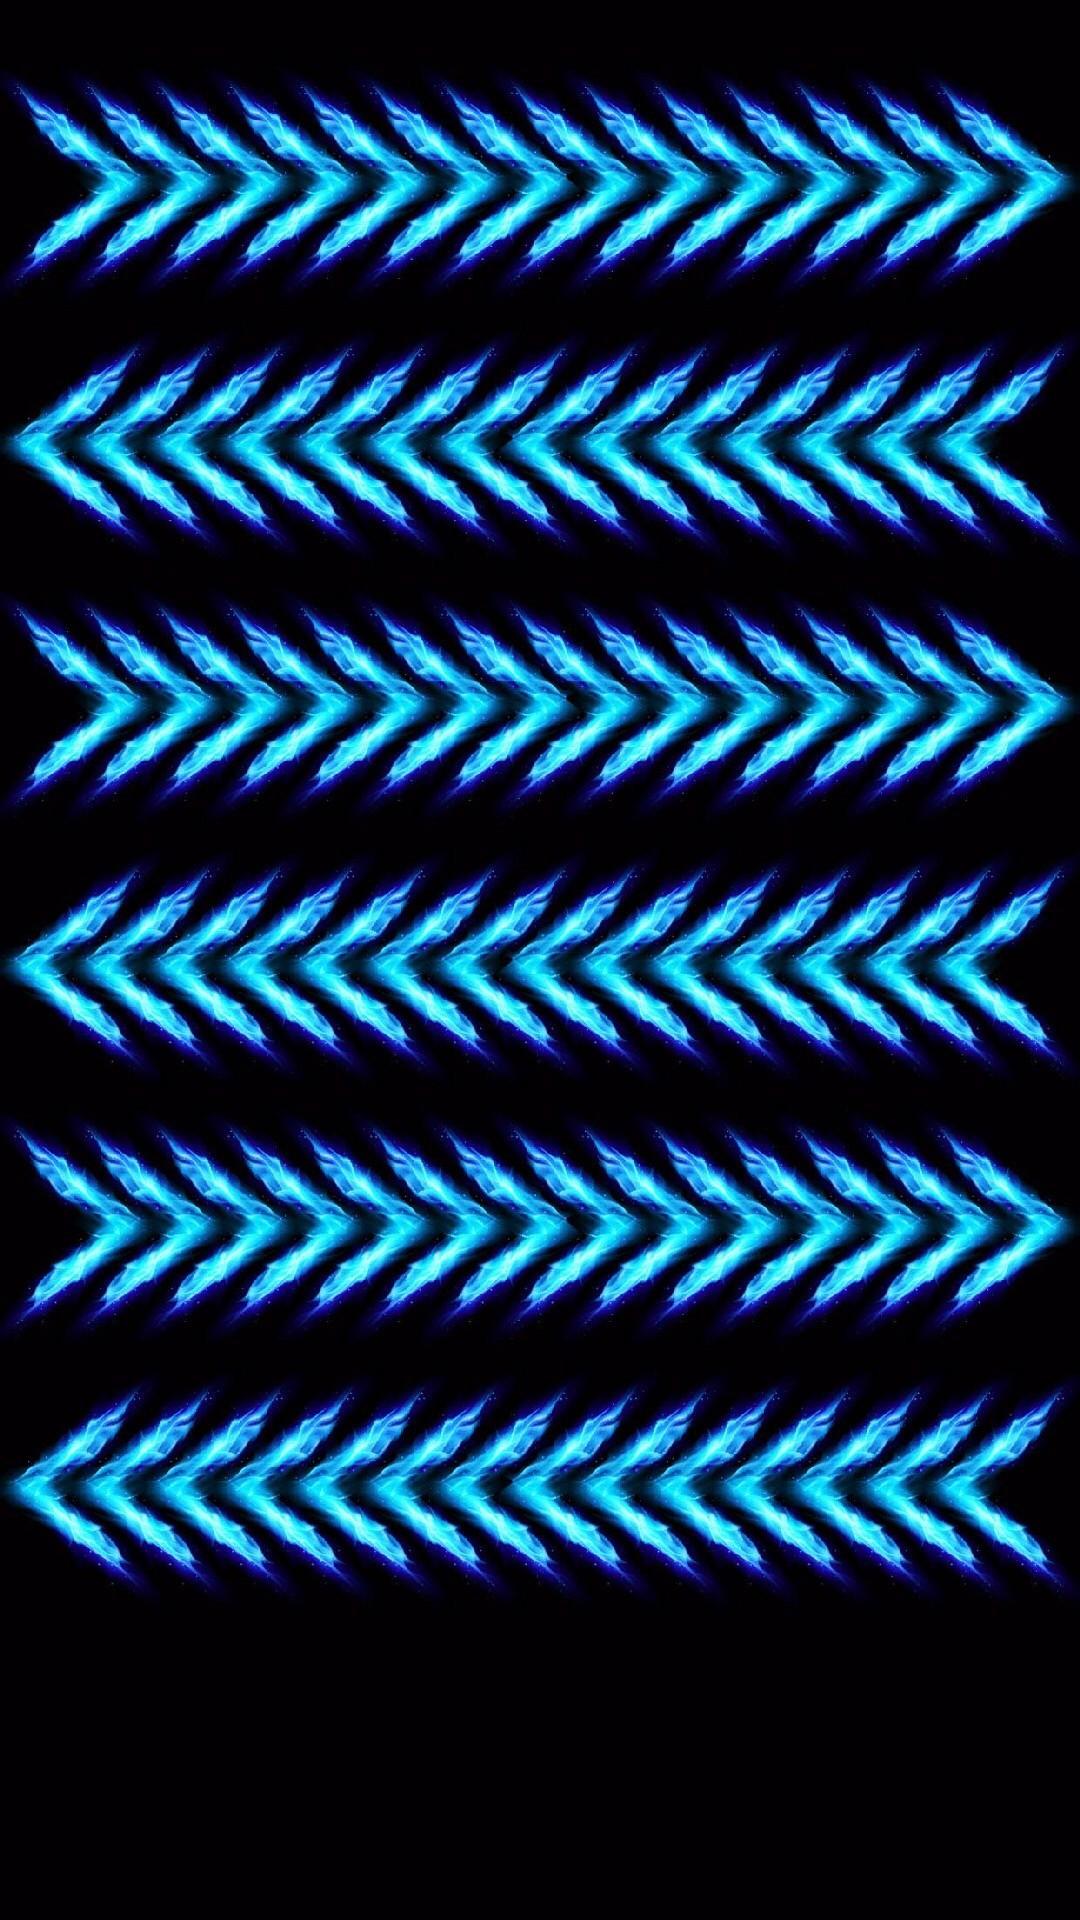 Shelves Simple Arrows Black Blue Minimalistic HD